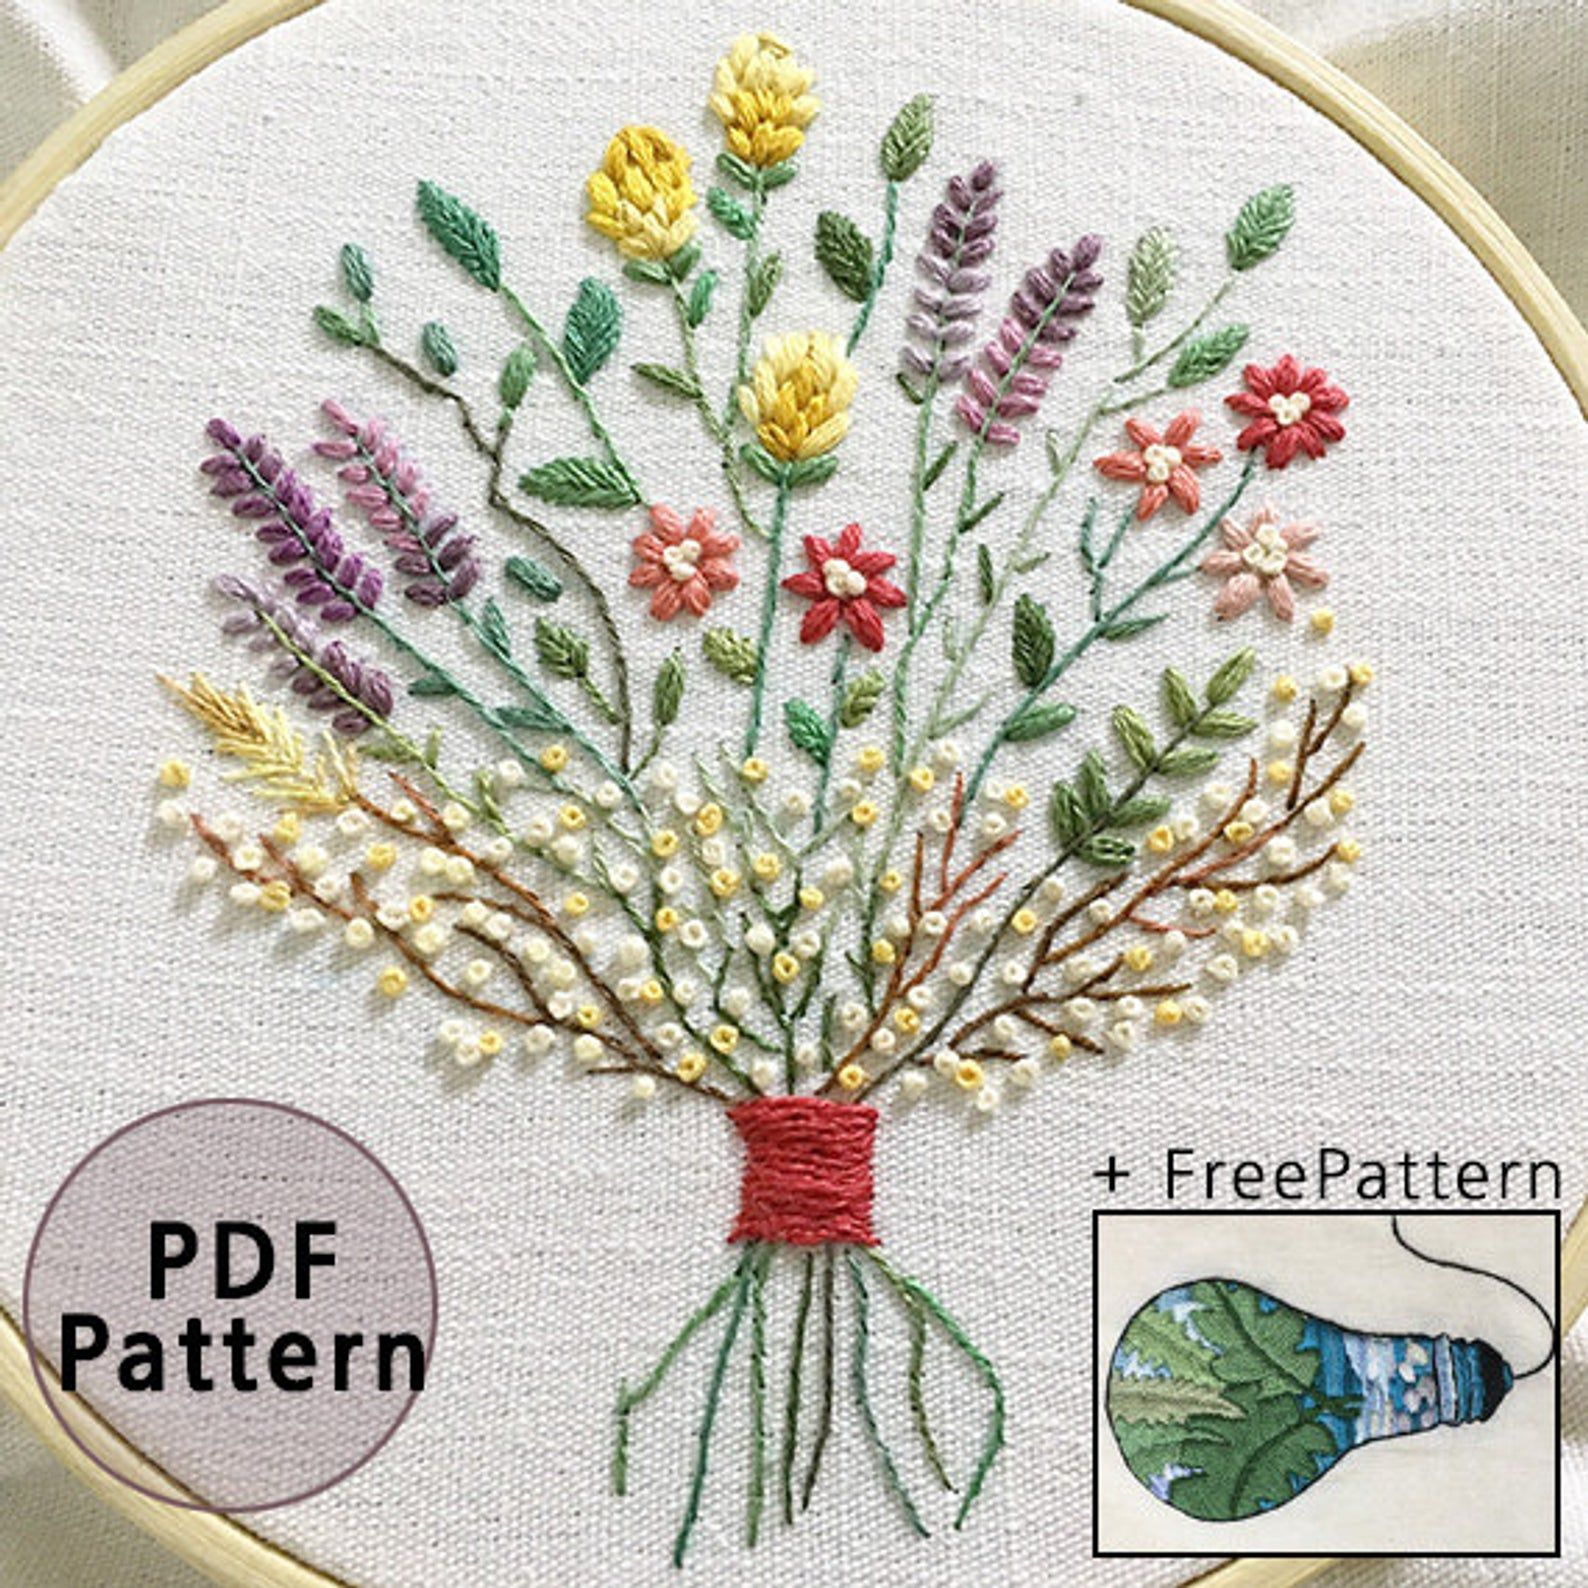 plus_ Bonus Free Pattern_Dried flower bouquet__PDF files